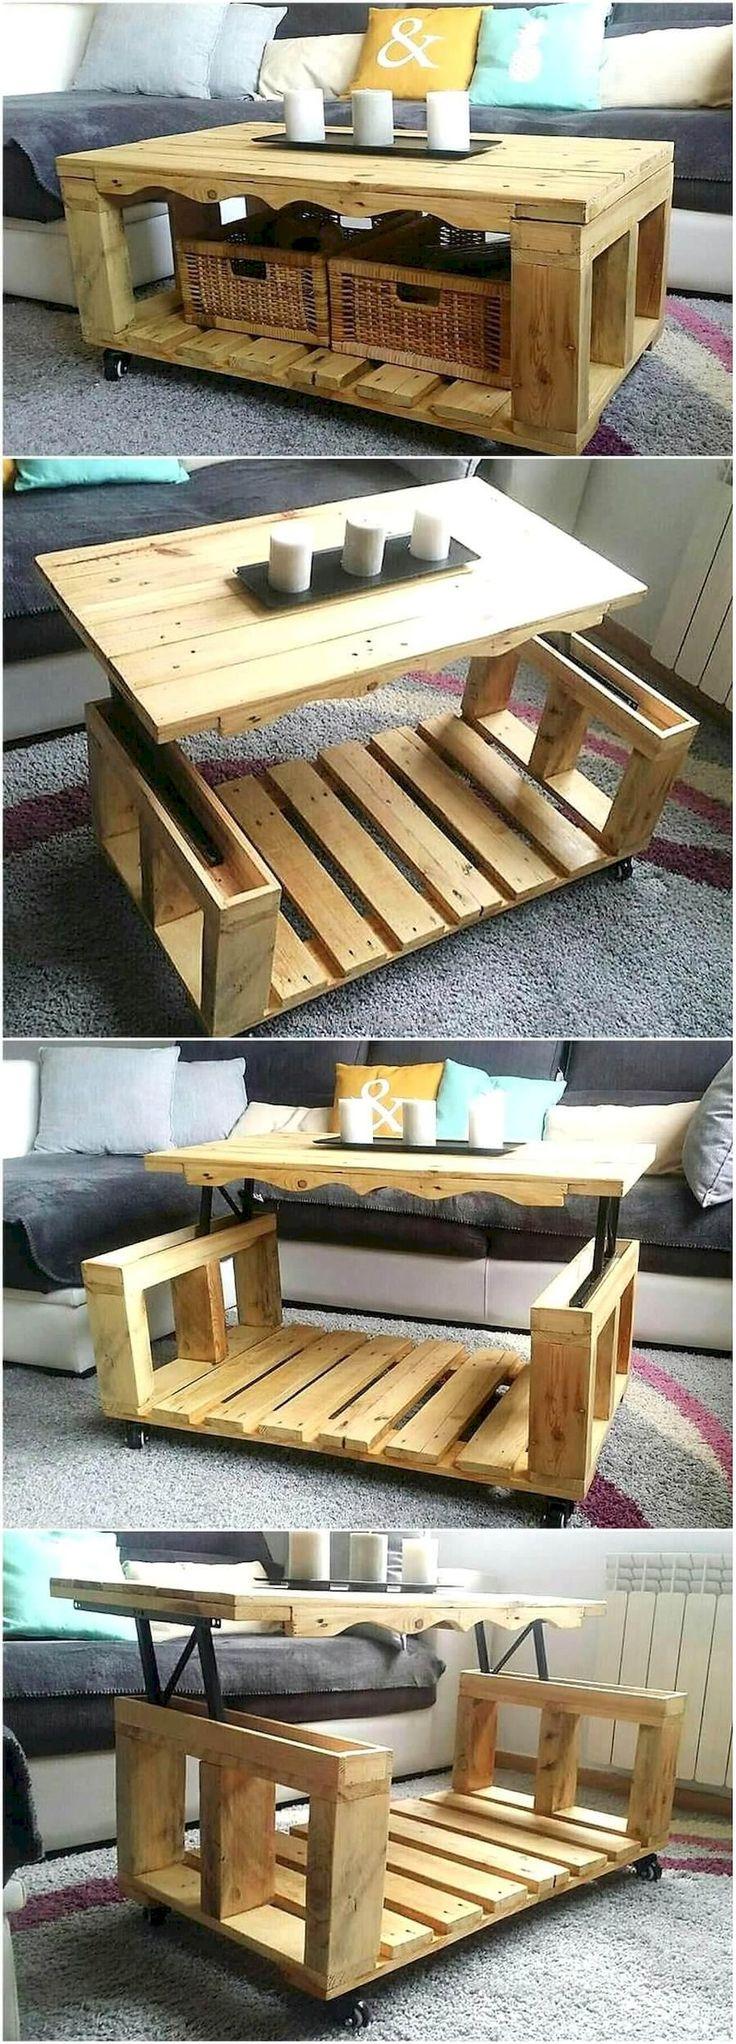 Attractive diy wodden pallet furniture projects 7